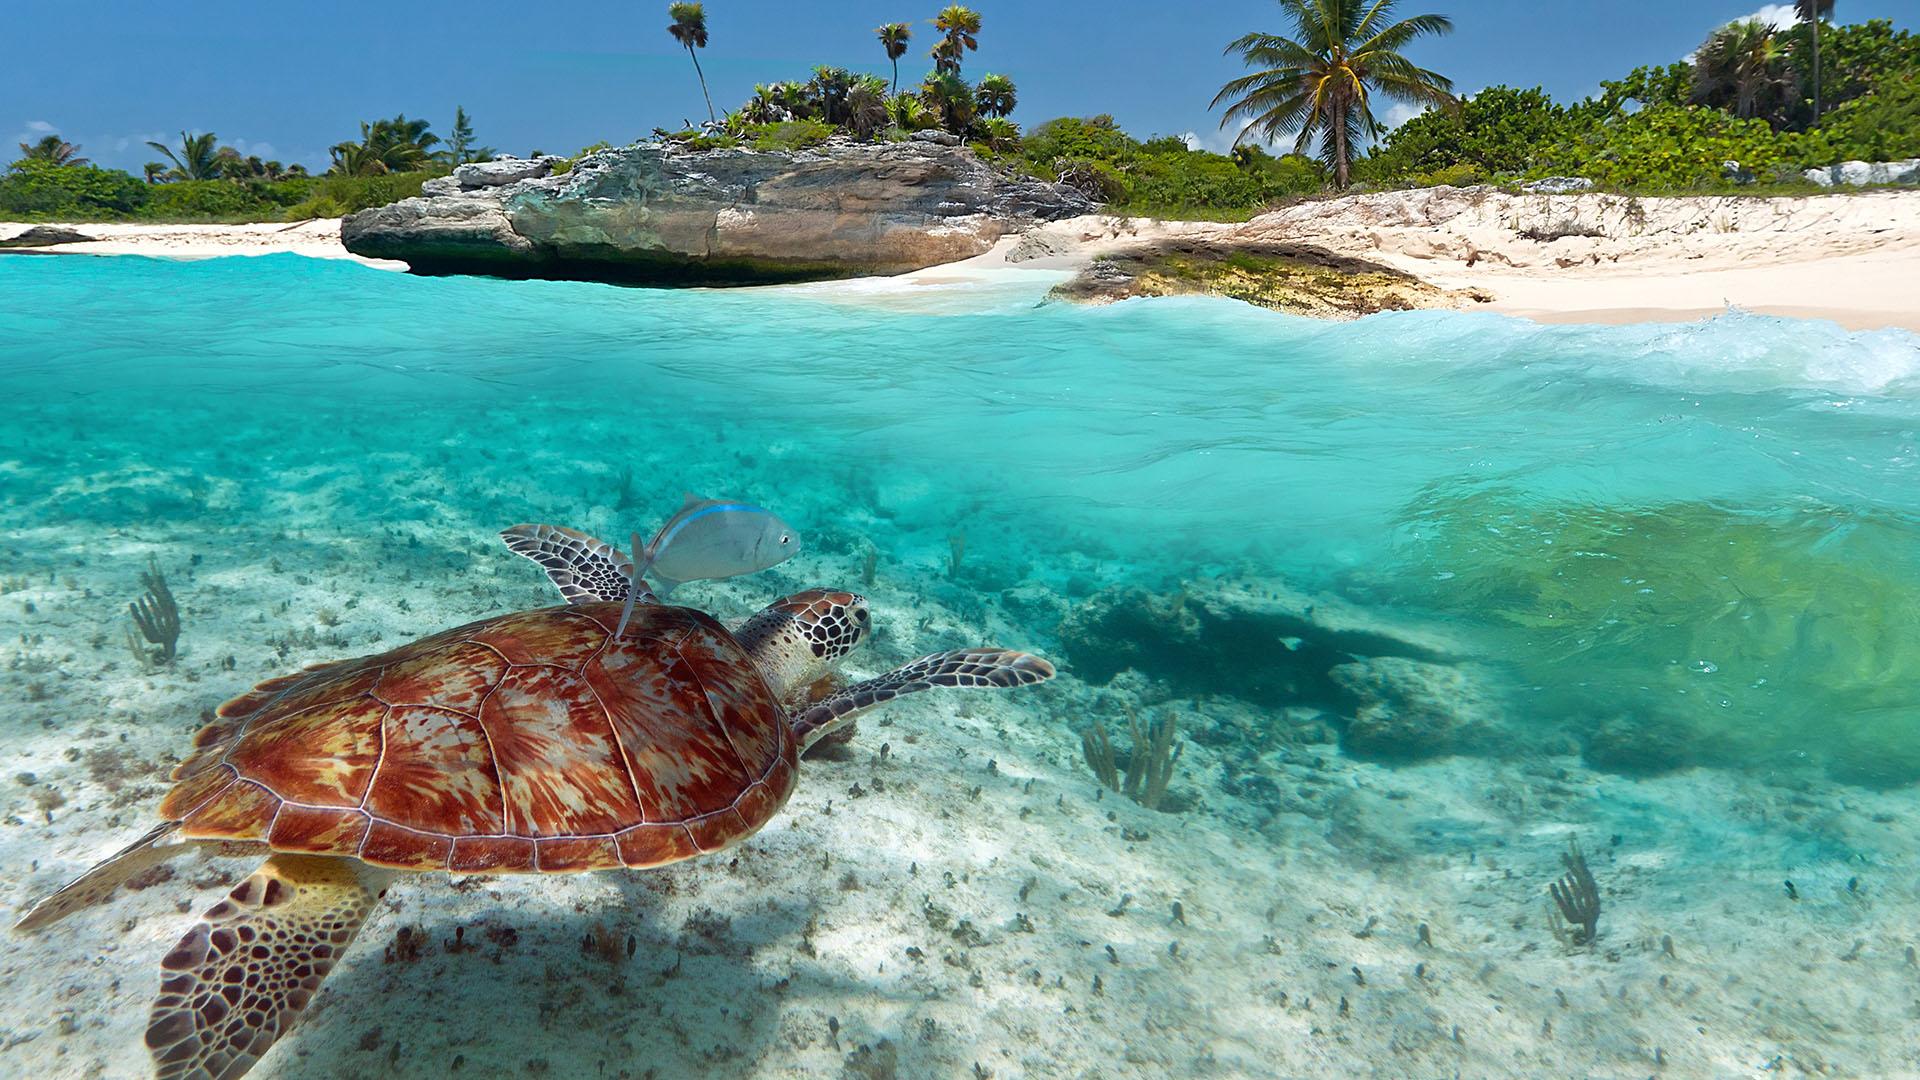 AvYachts Destination - The British Virgin Islands